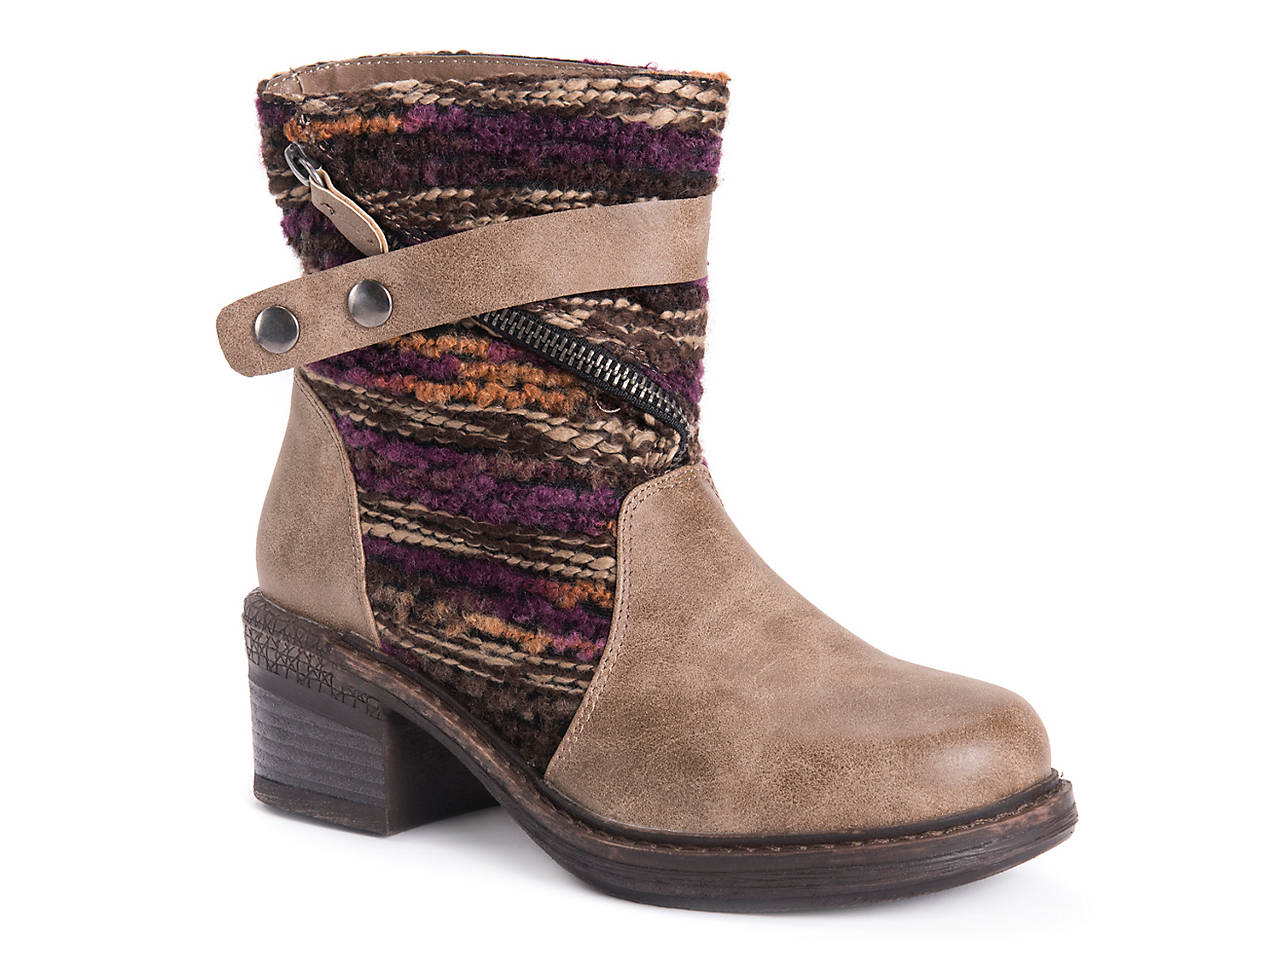 ea8e69e1efdd Muk Luks Marni Bootie Women s Shoes